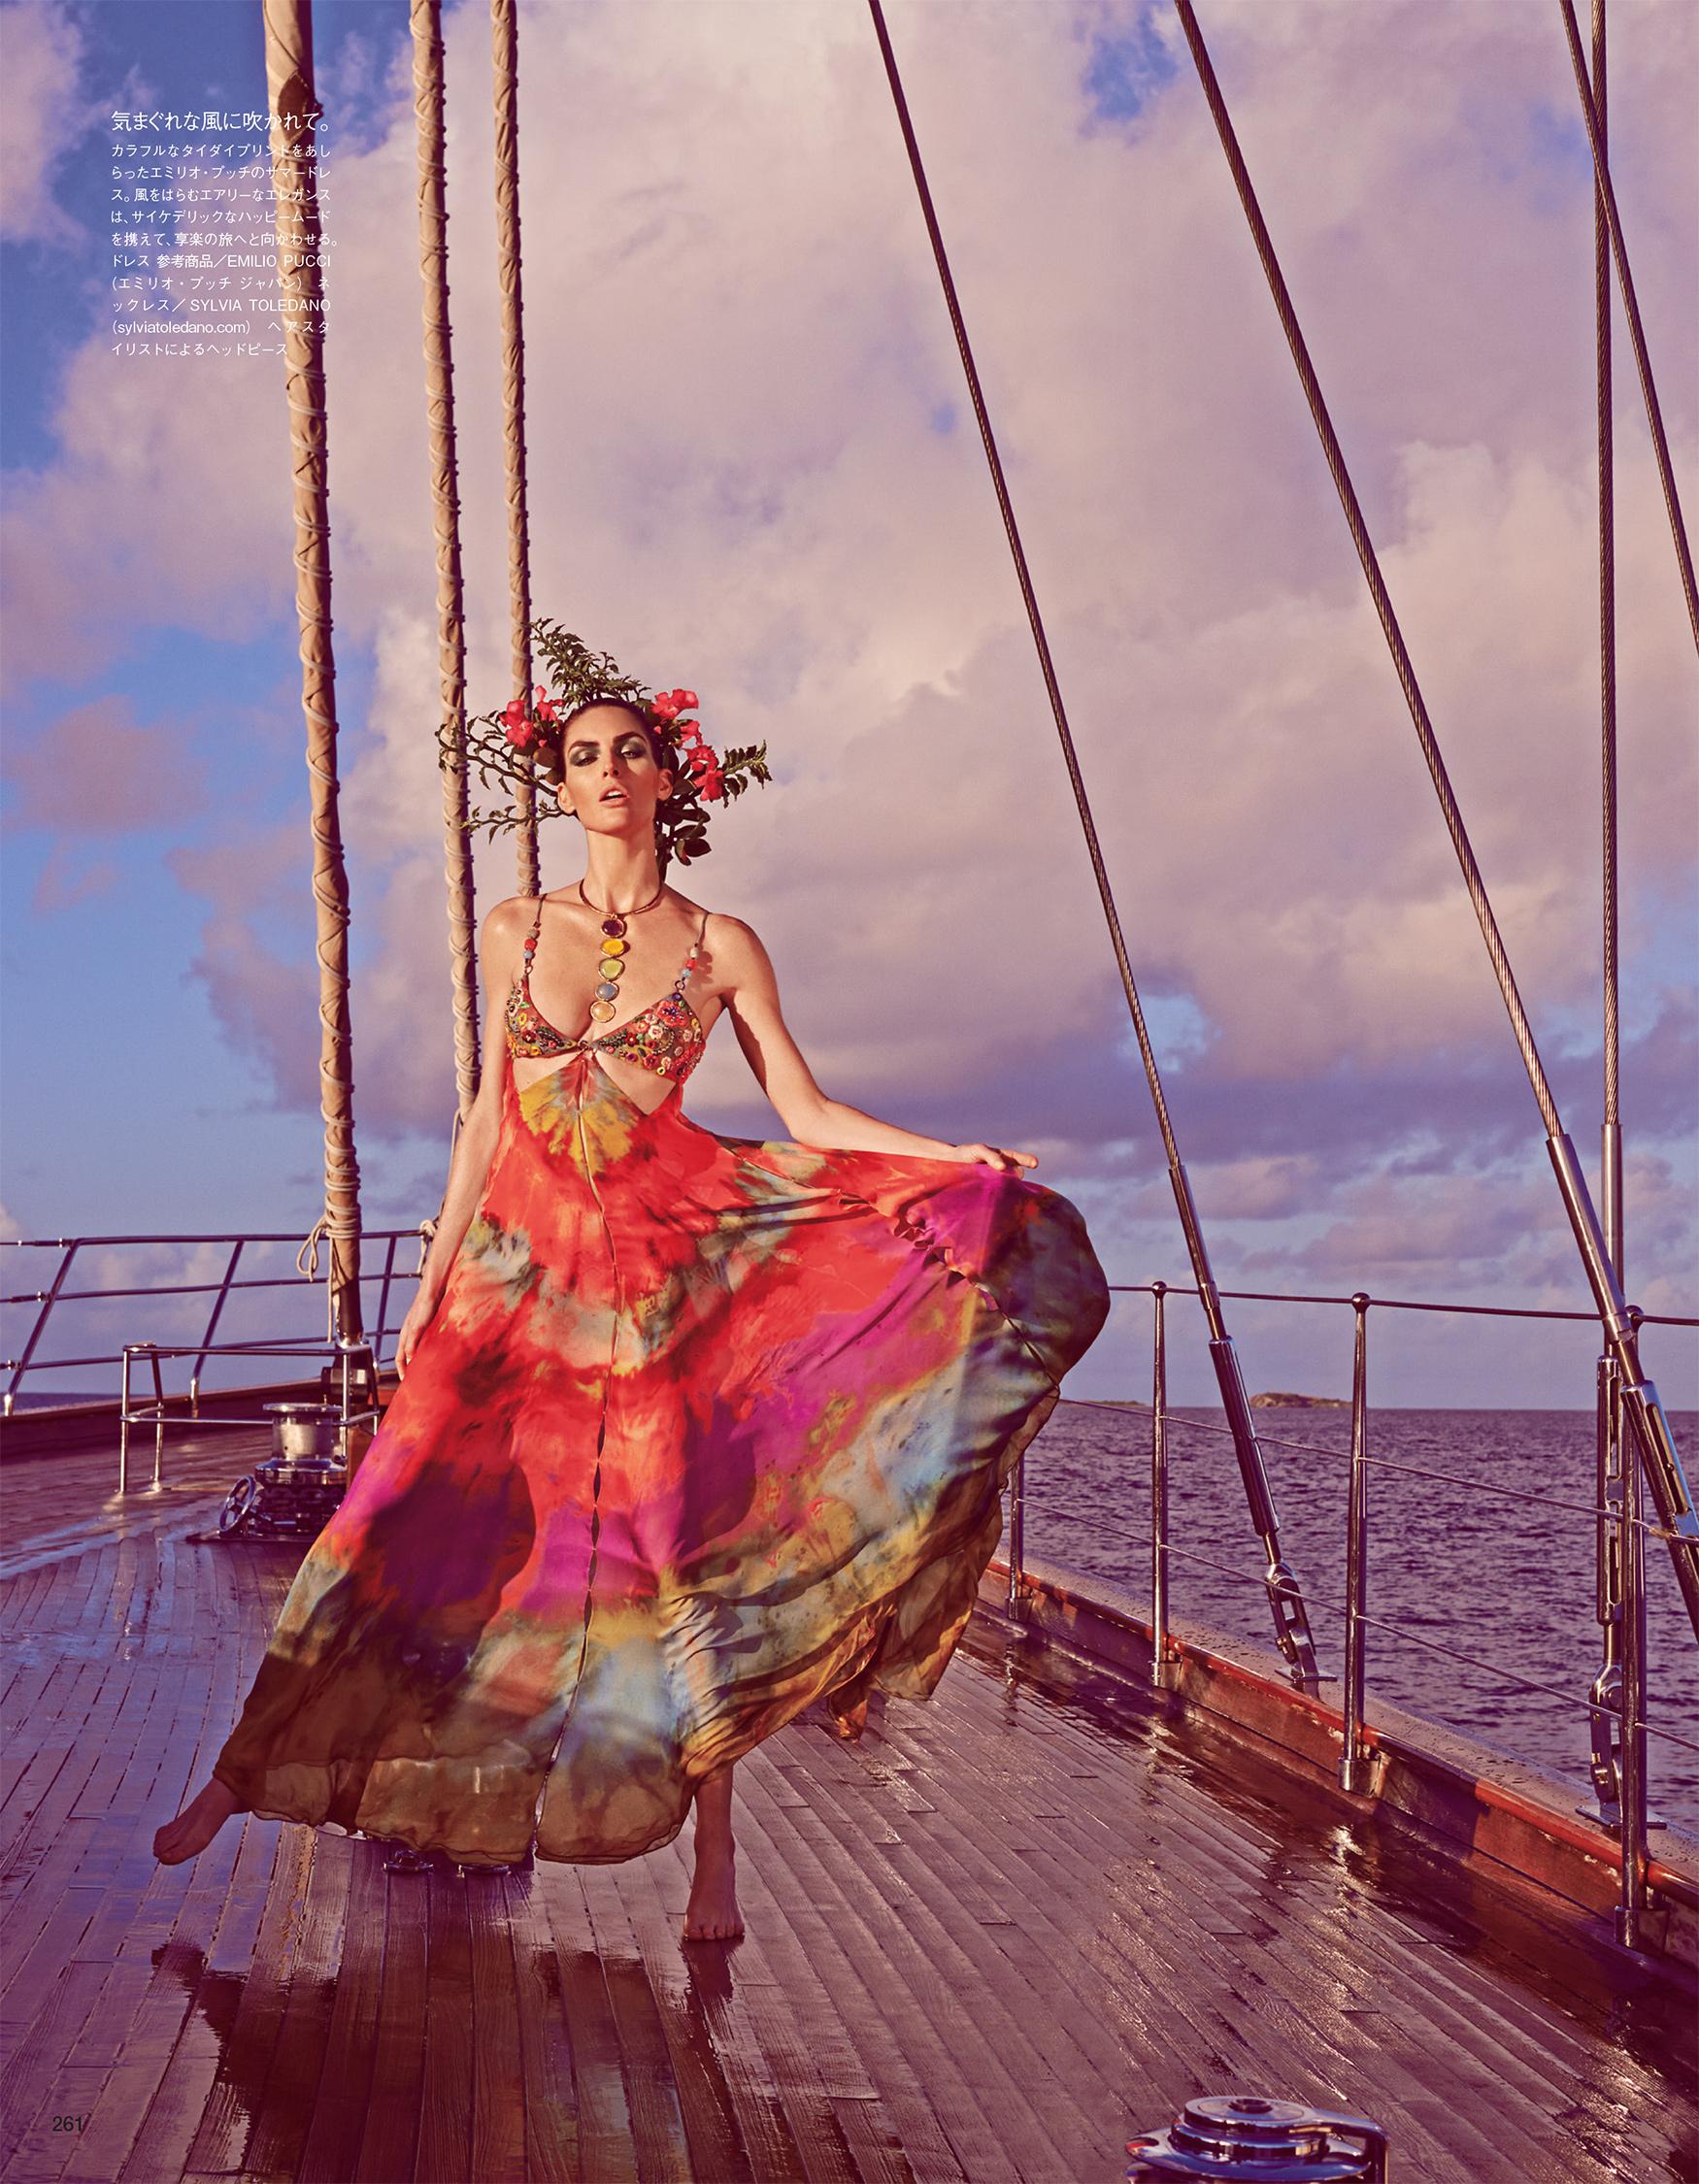 Giovanna-Battaglia-Vogue-Japan-Mariano-Vivanco-Forbidden-Paradise-3.jpg